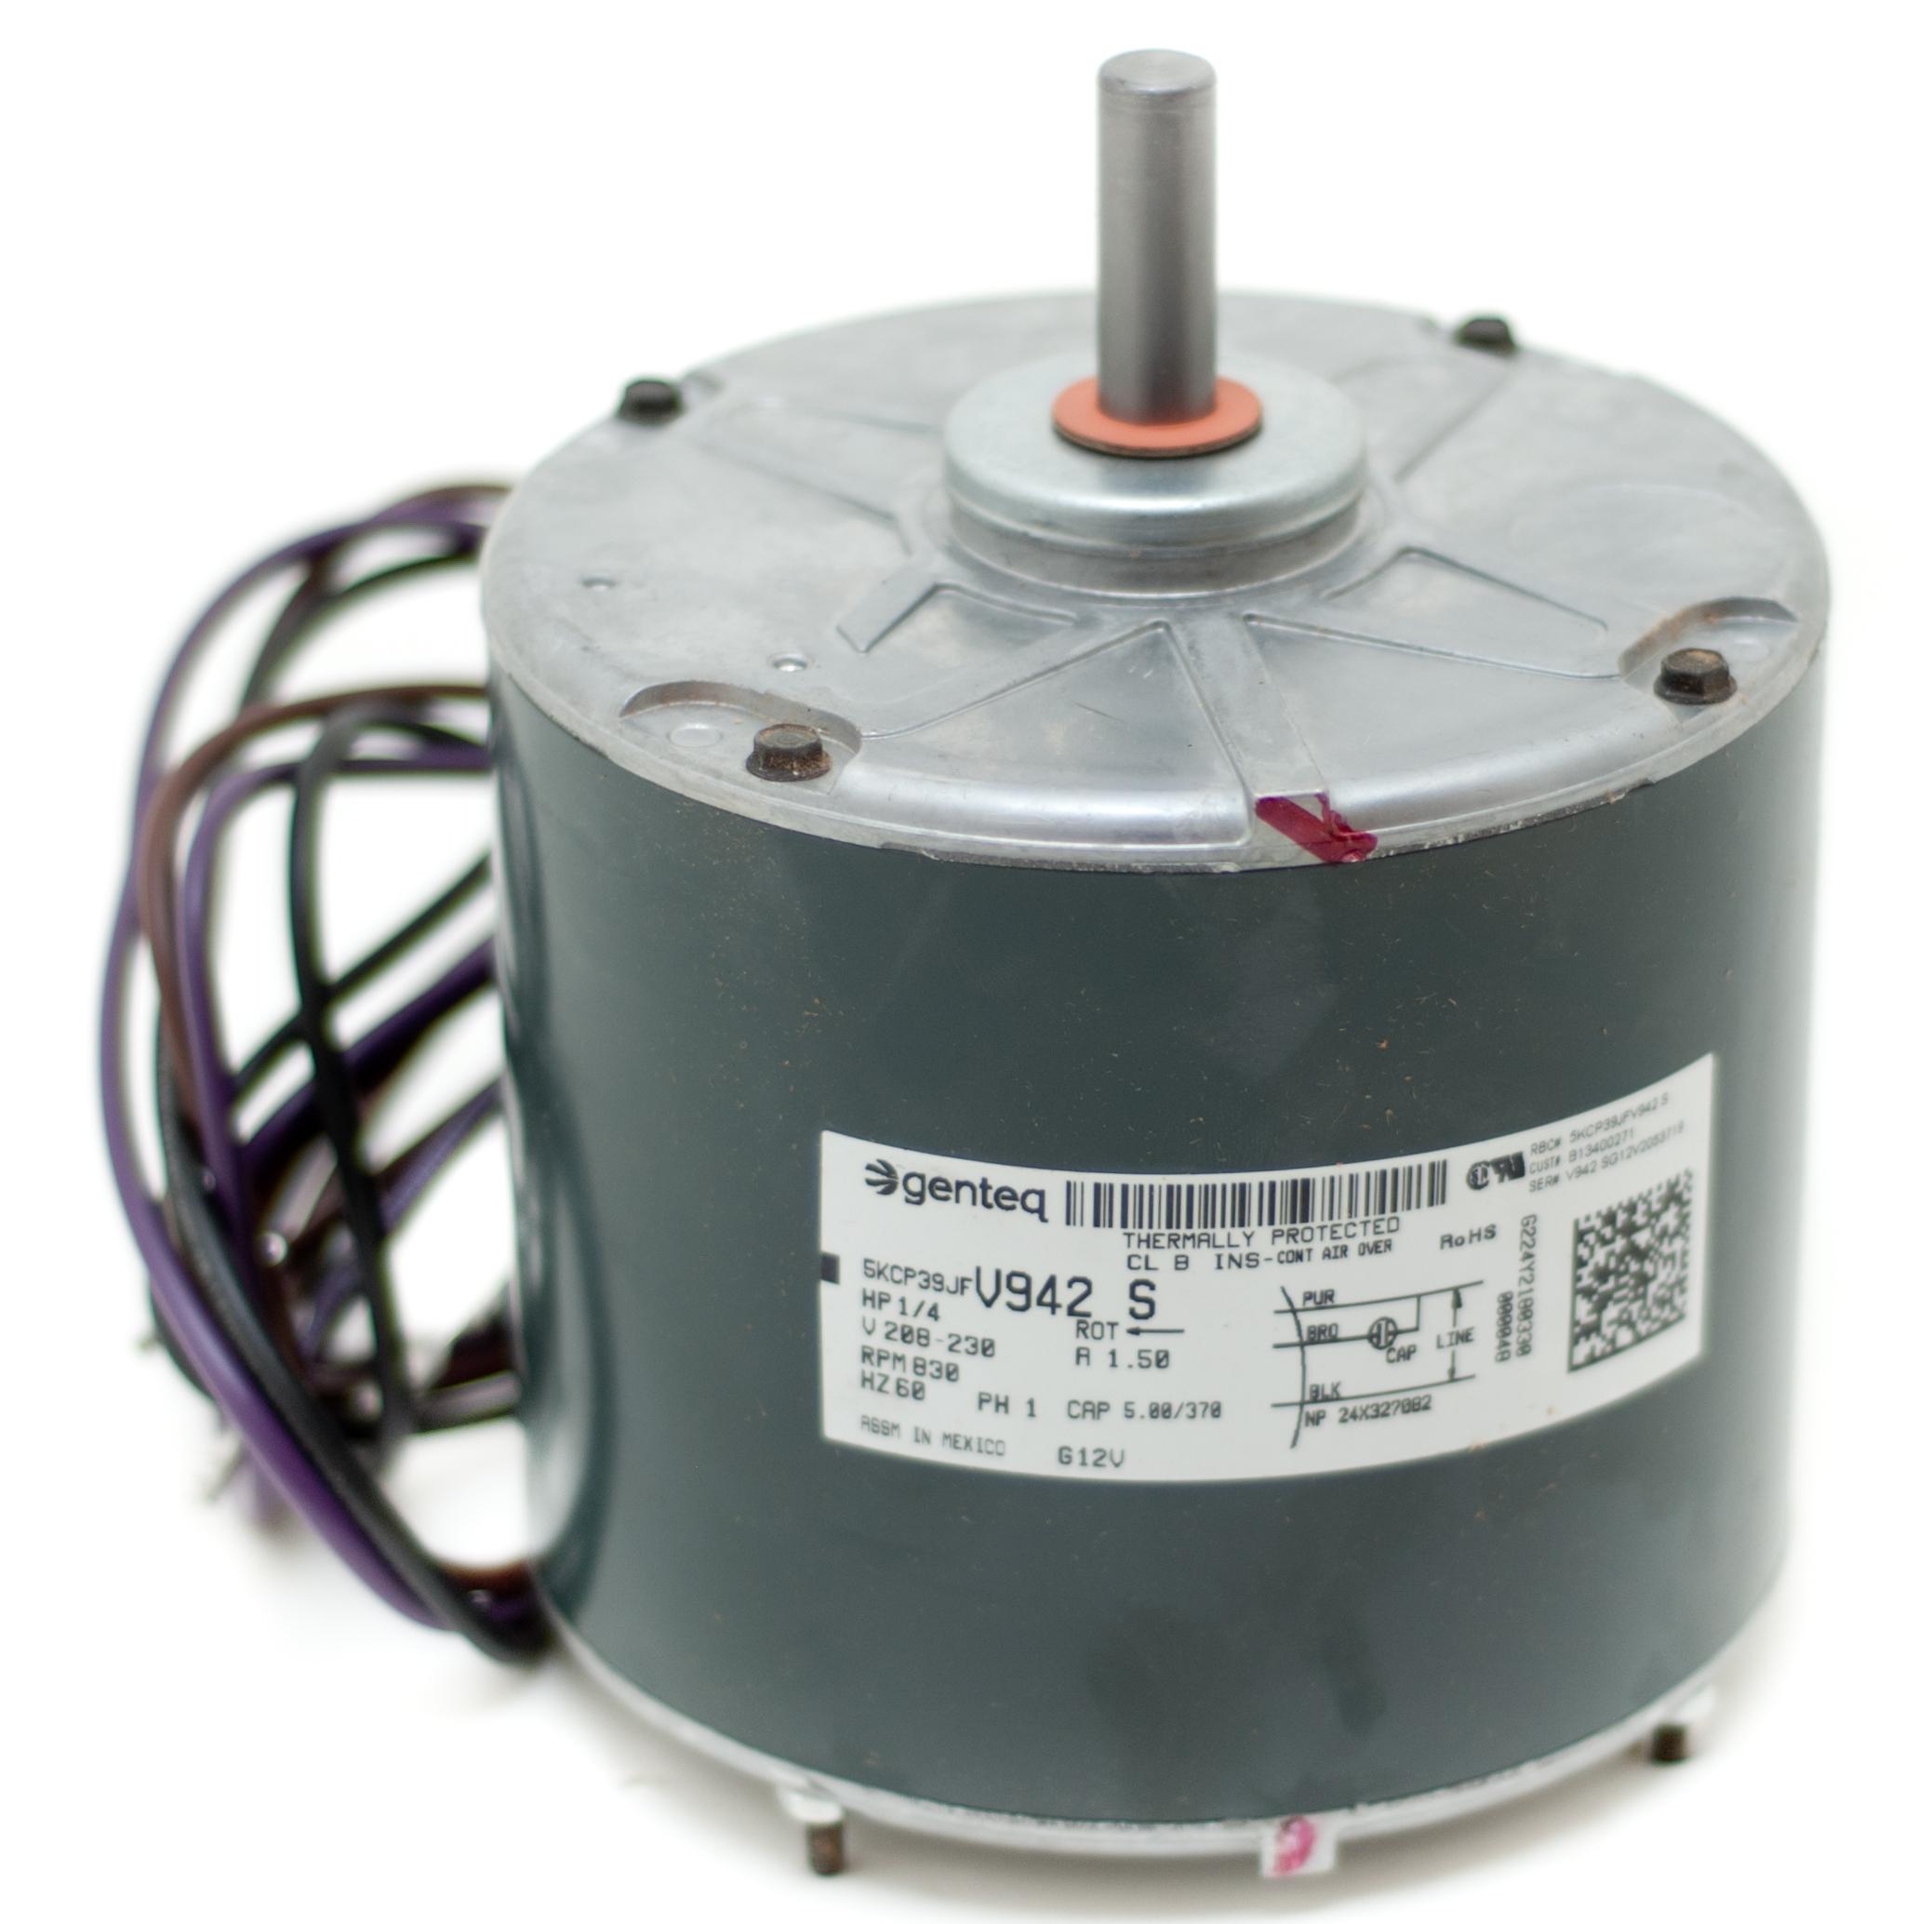 ac condenser fan motor wiring diagram 1969 ford mustang ignition switch  b13400271s janitrol goodman 1 4 hp